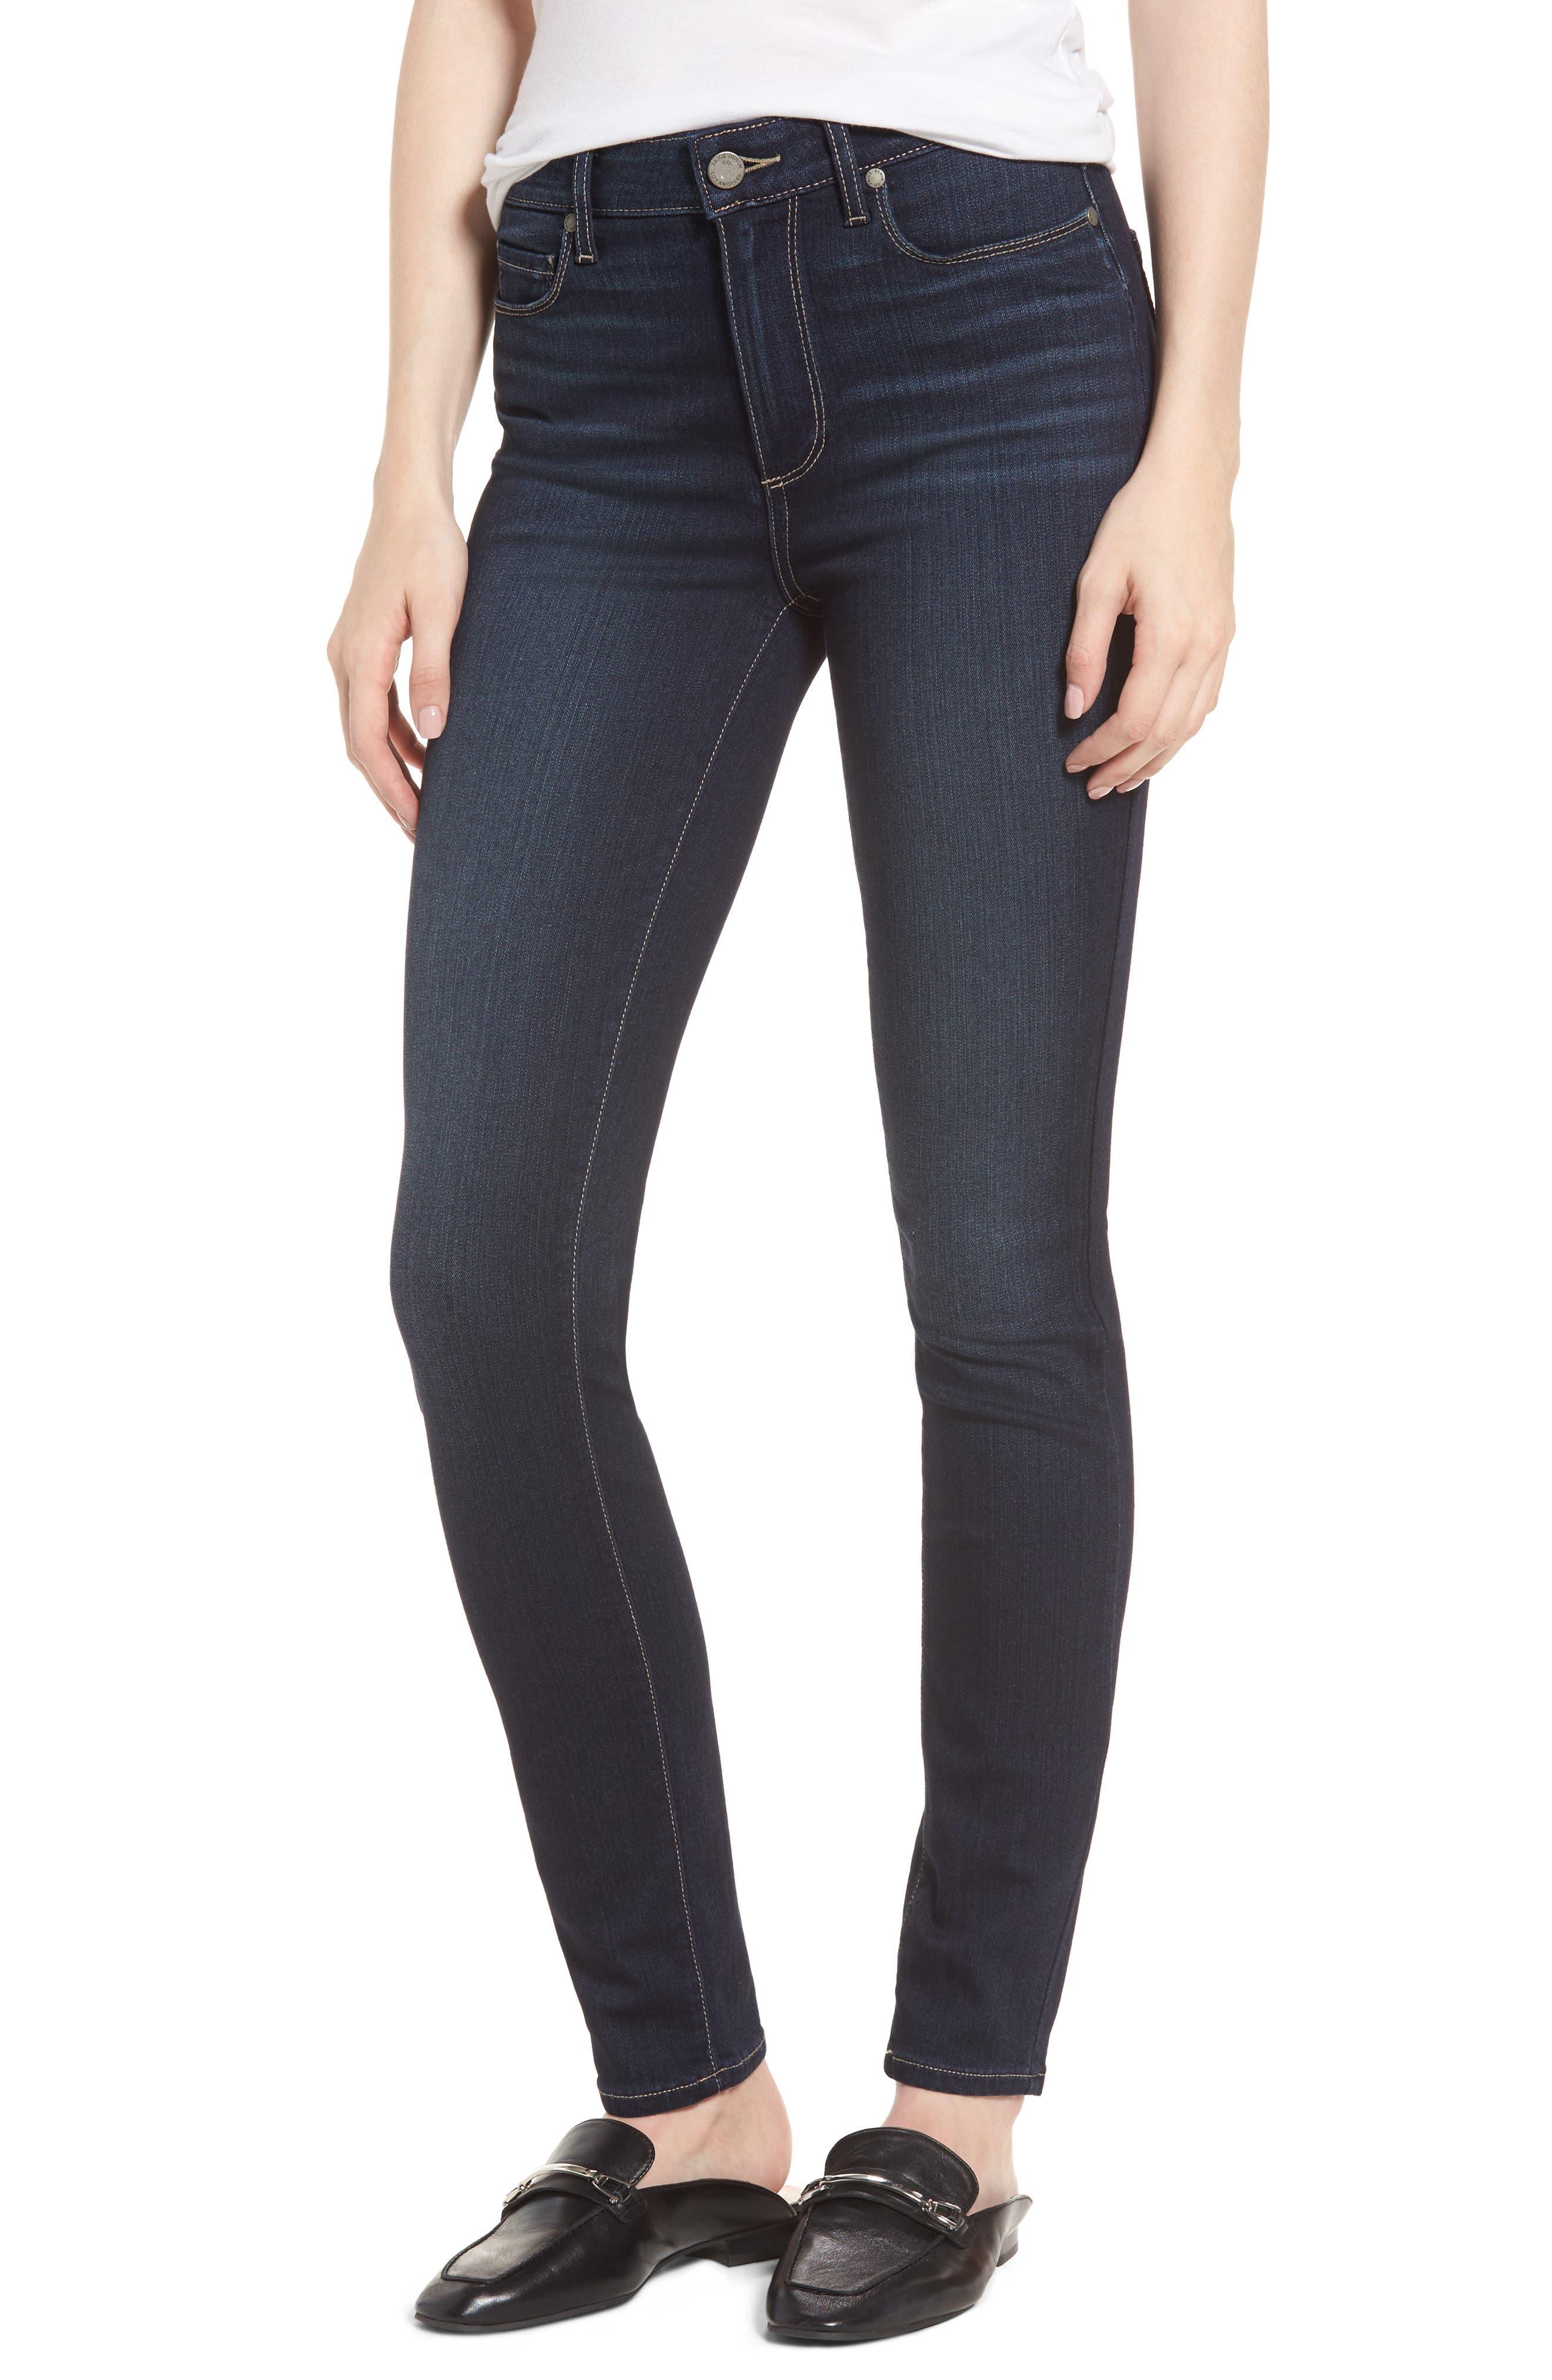 PAIGE Transcend Vintage - Hoxton High Waist Ultra Skinny Jeans (Gardena)